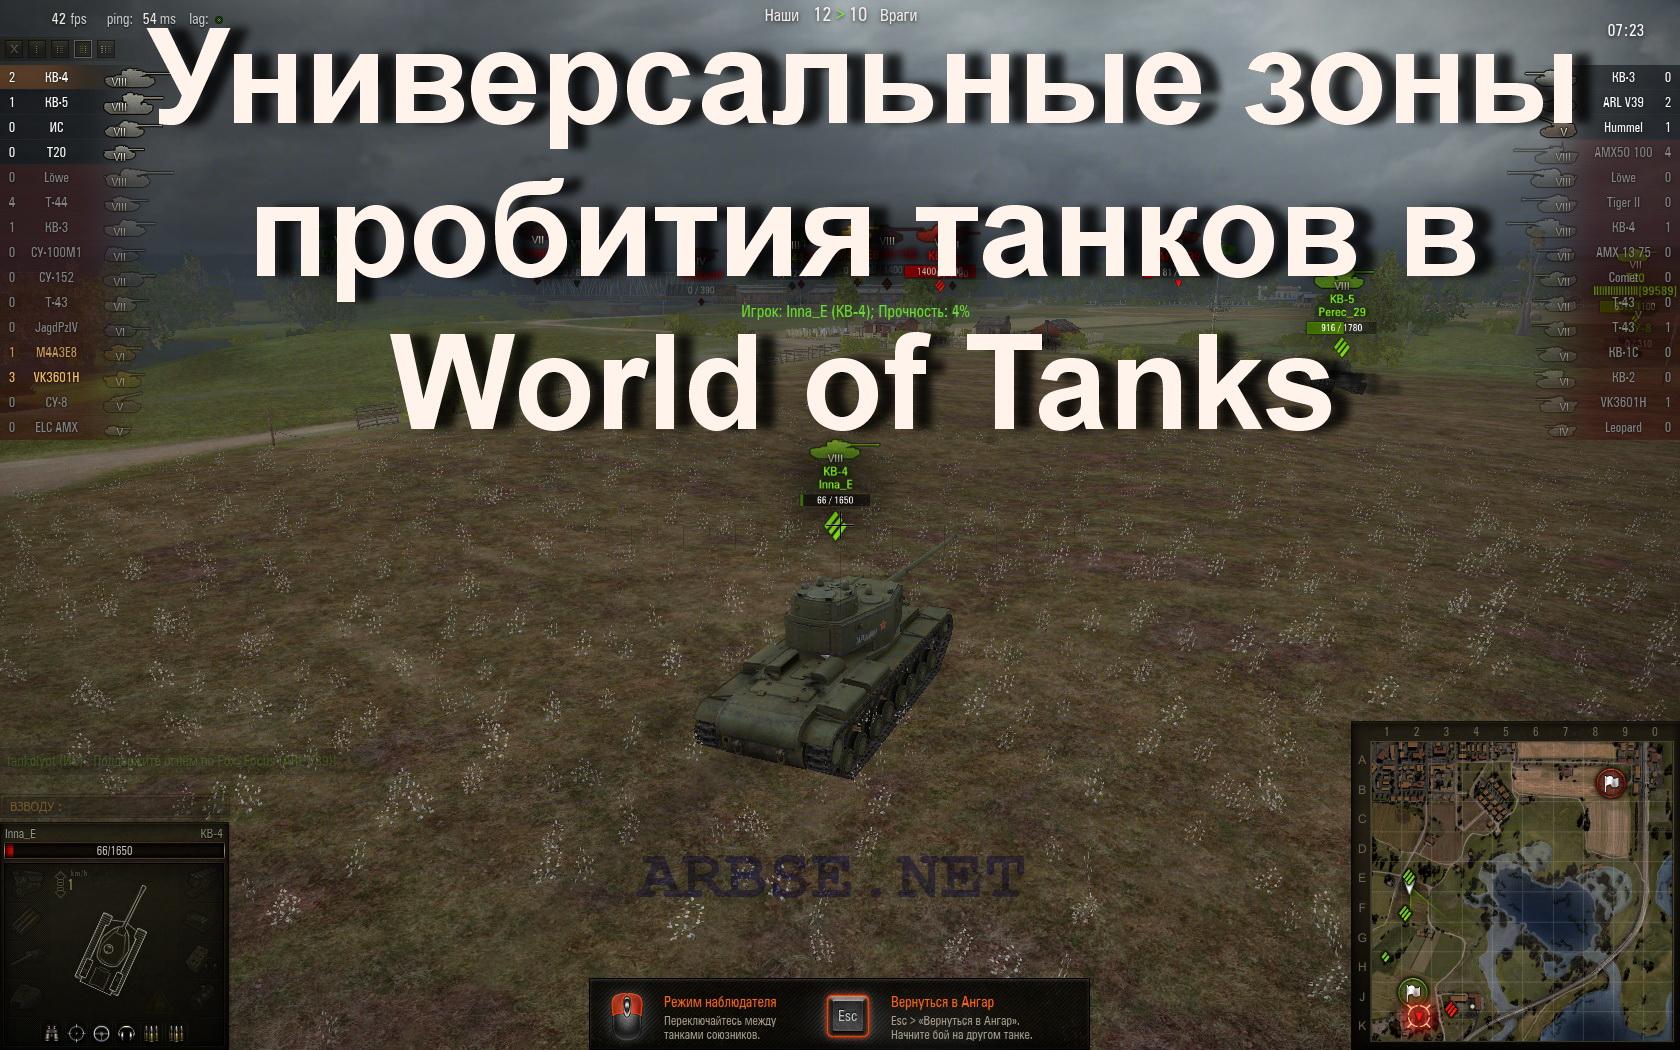 Зоны пробития для world of tanks 0 9 1